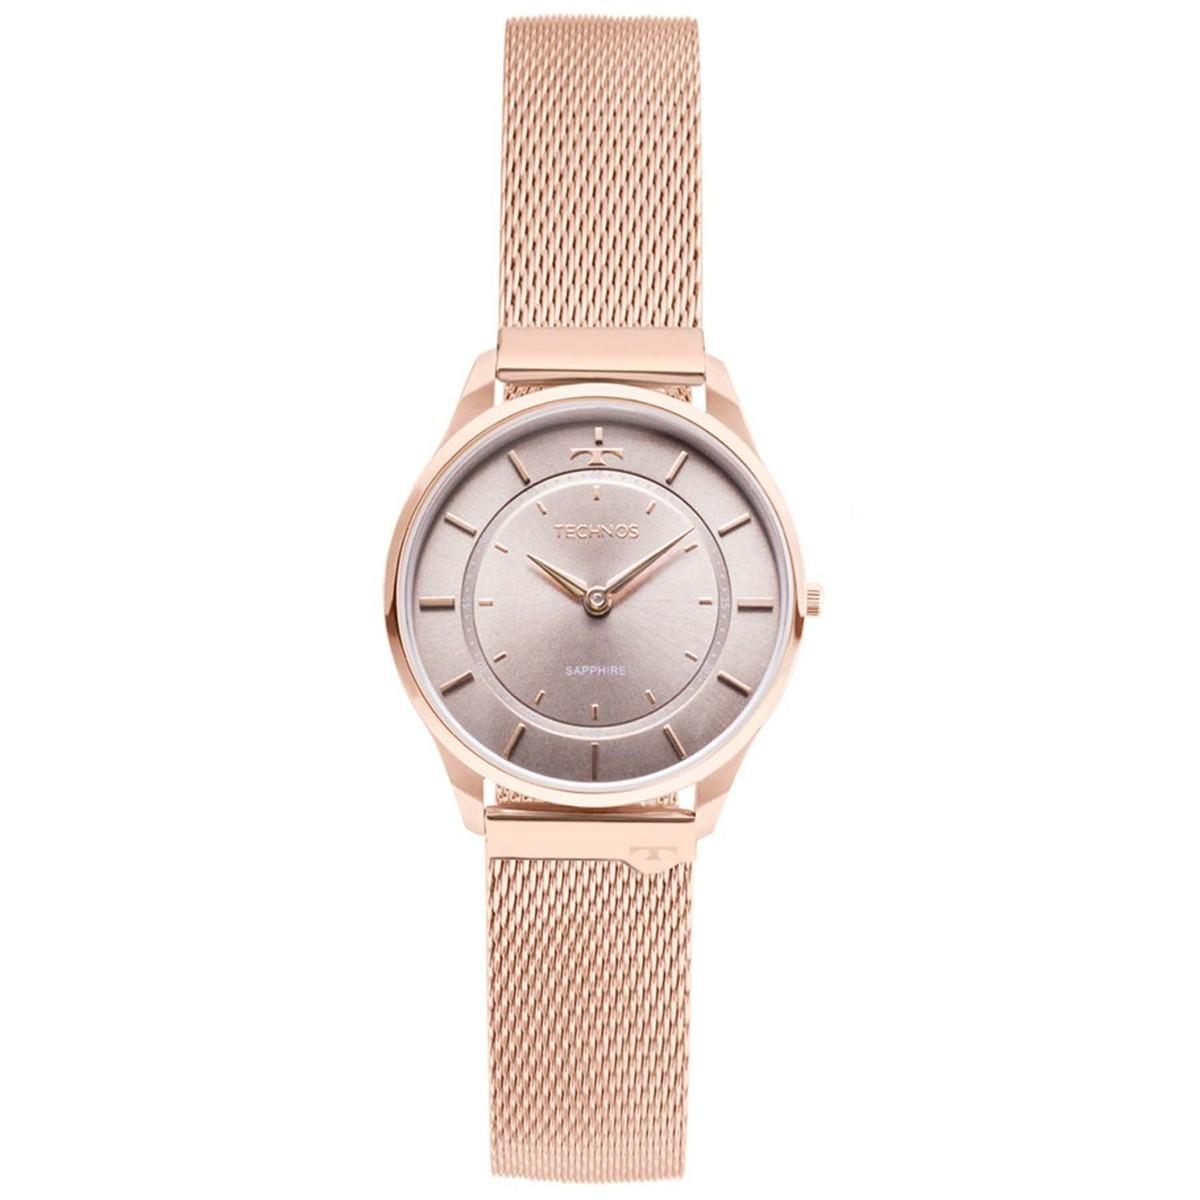 Relógio Technos Feminino - 9T22AL/4C  - Dumont Online - Joias e Relógios